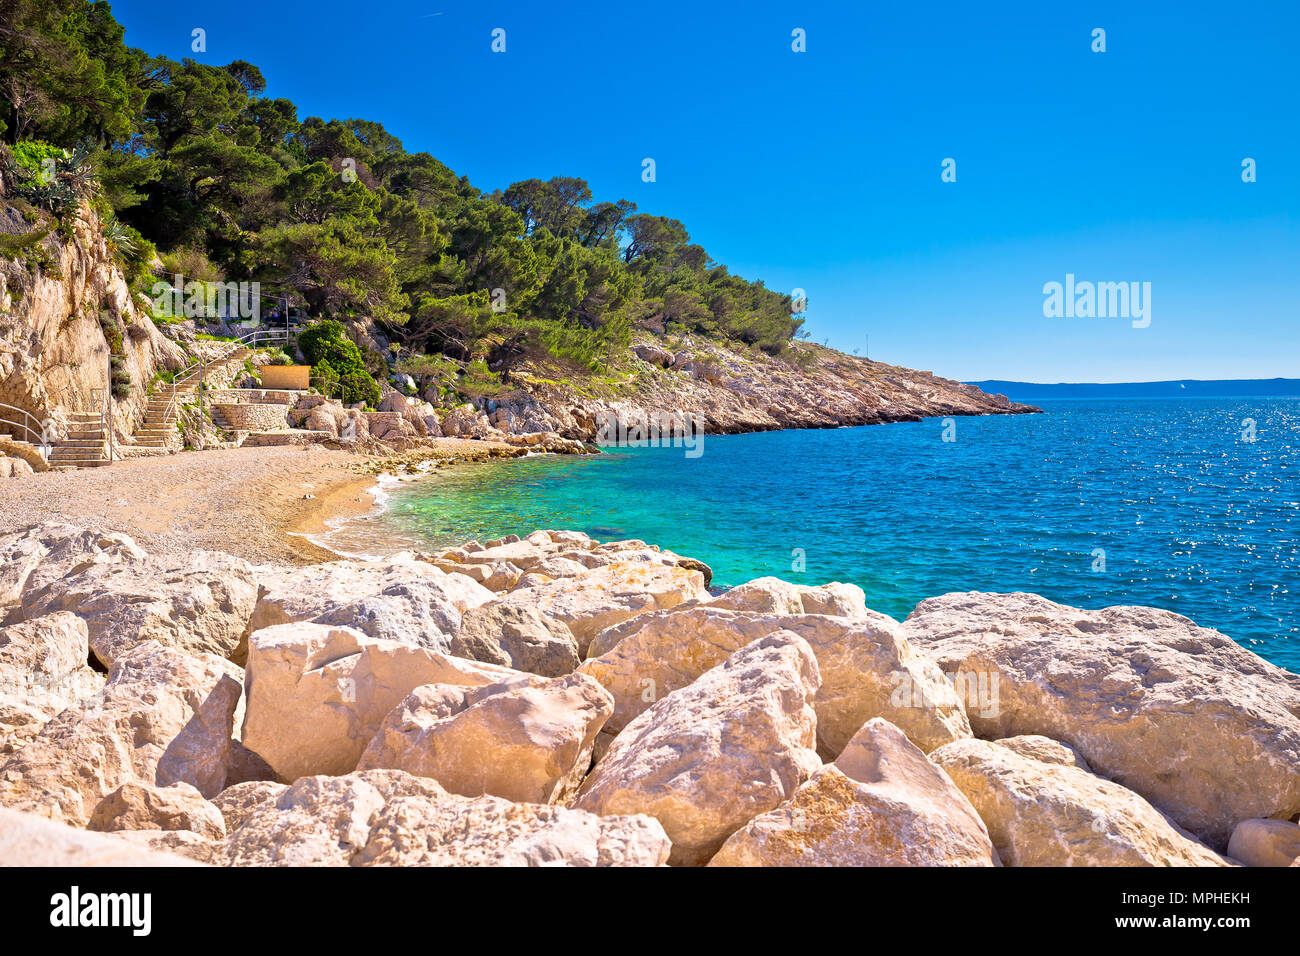 Makarska turquoise beach at sunny day view, Dalmatia region of Croatia Stock Photo